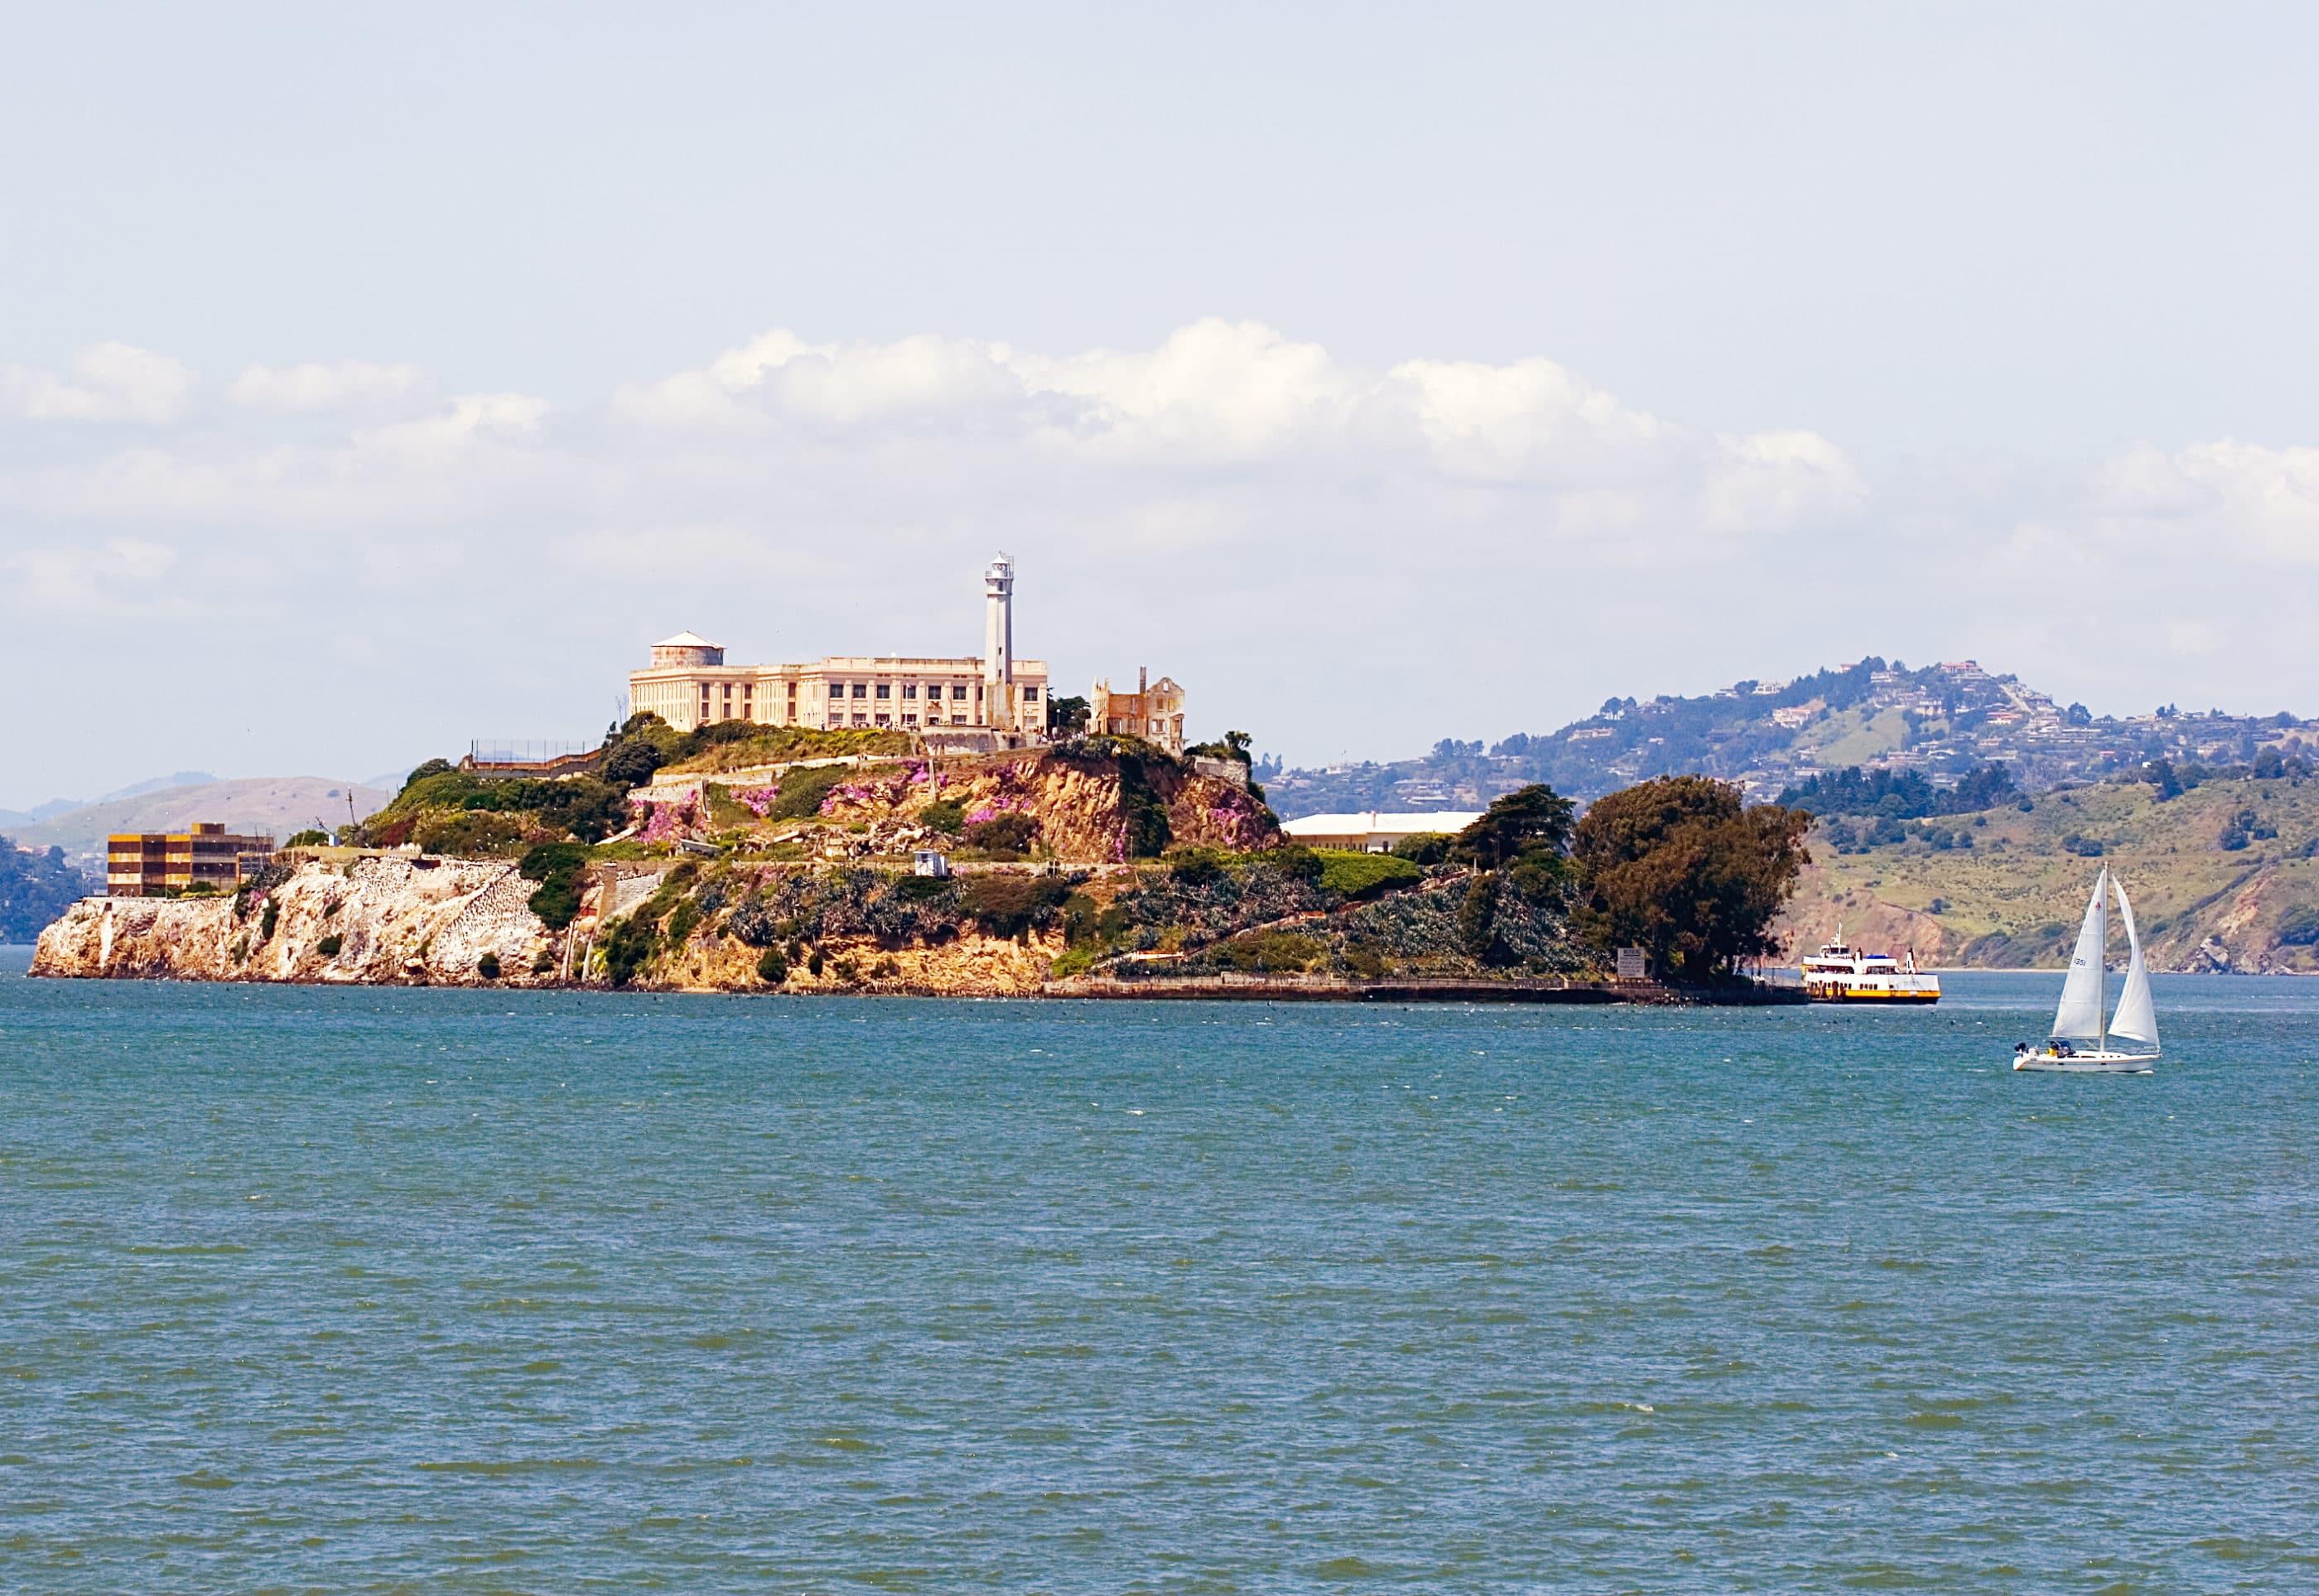 View of Alcatraz Island over the bay